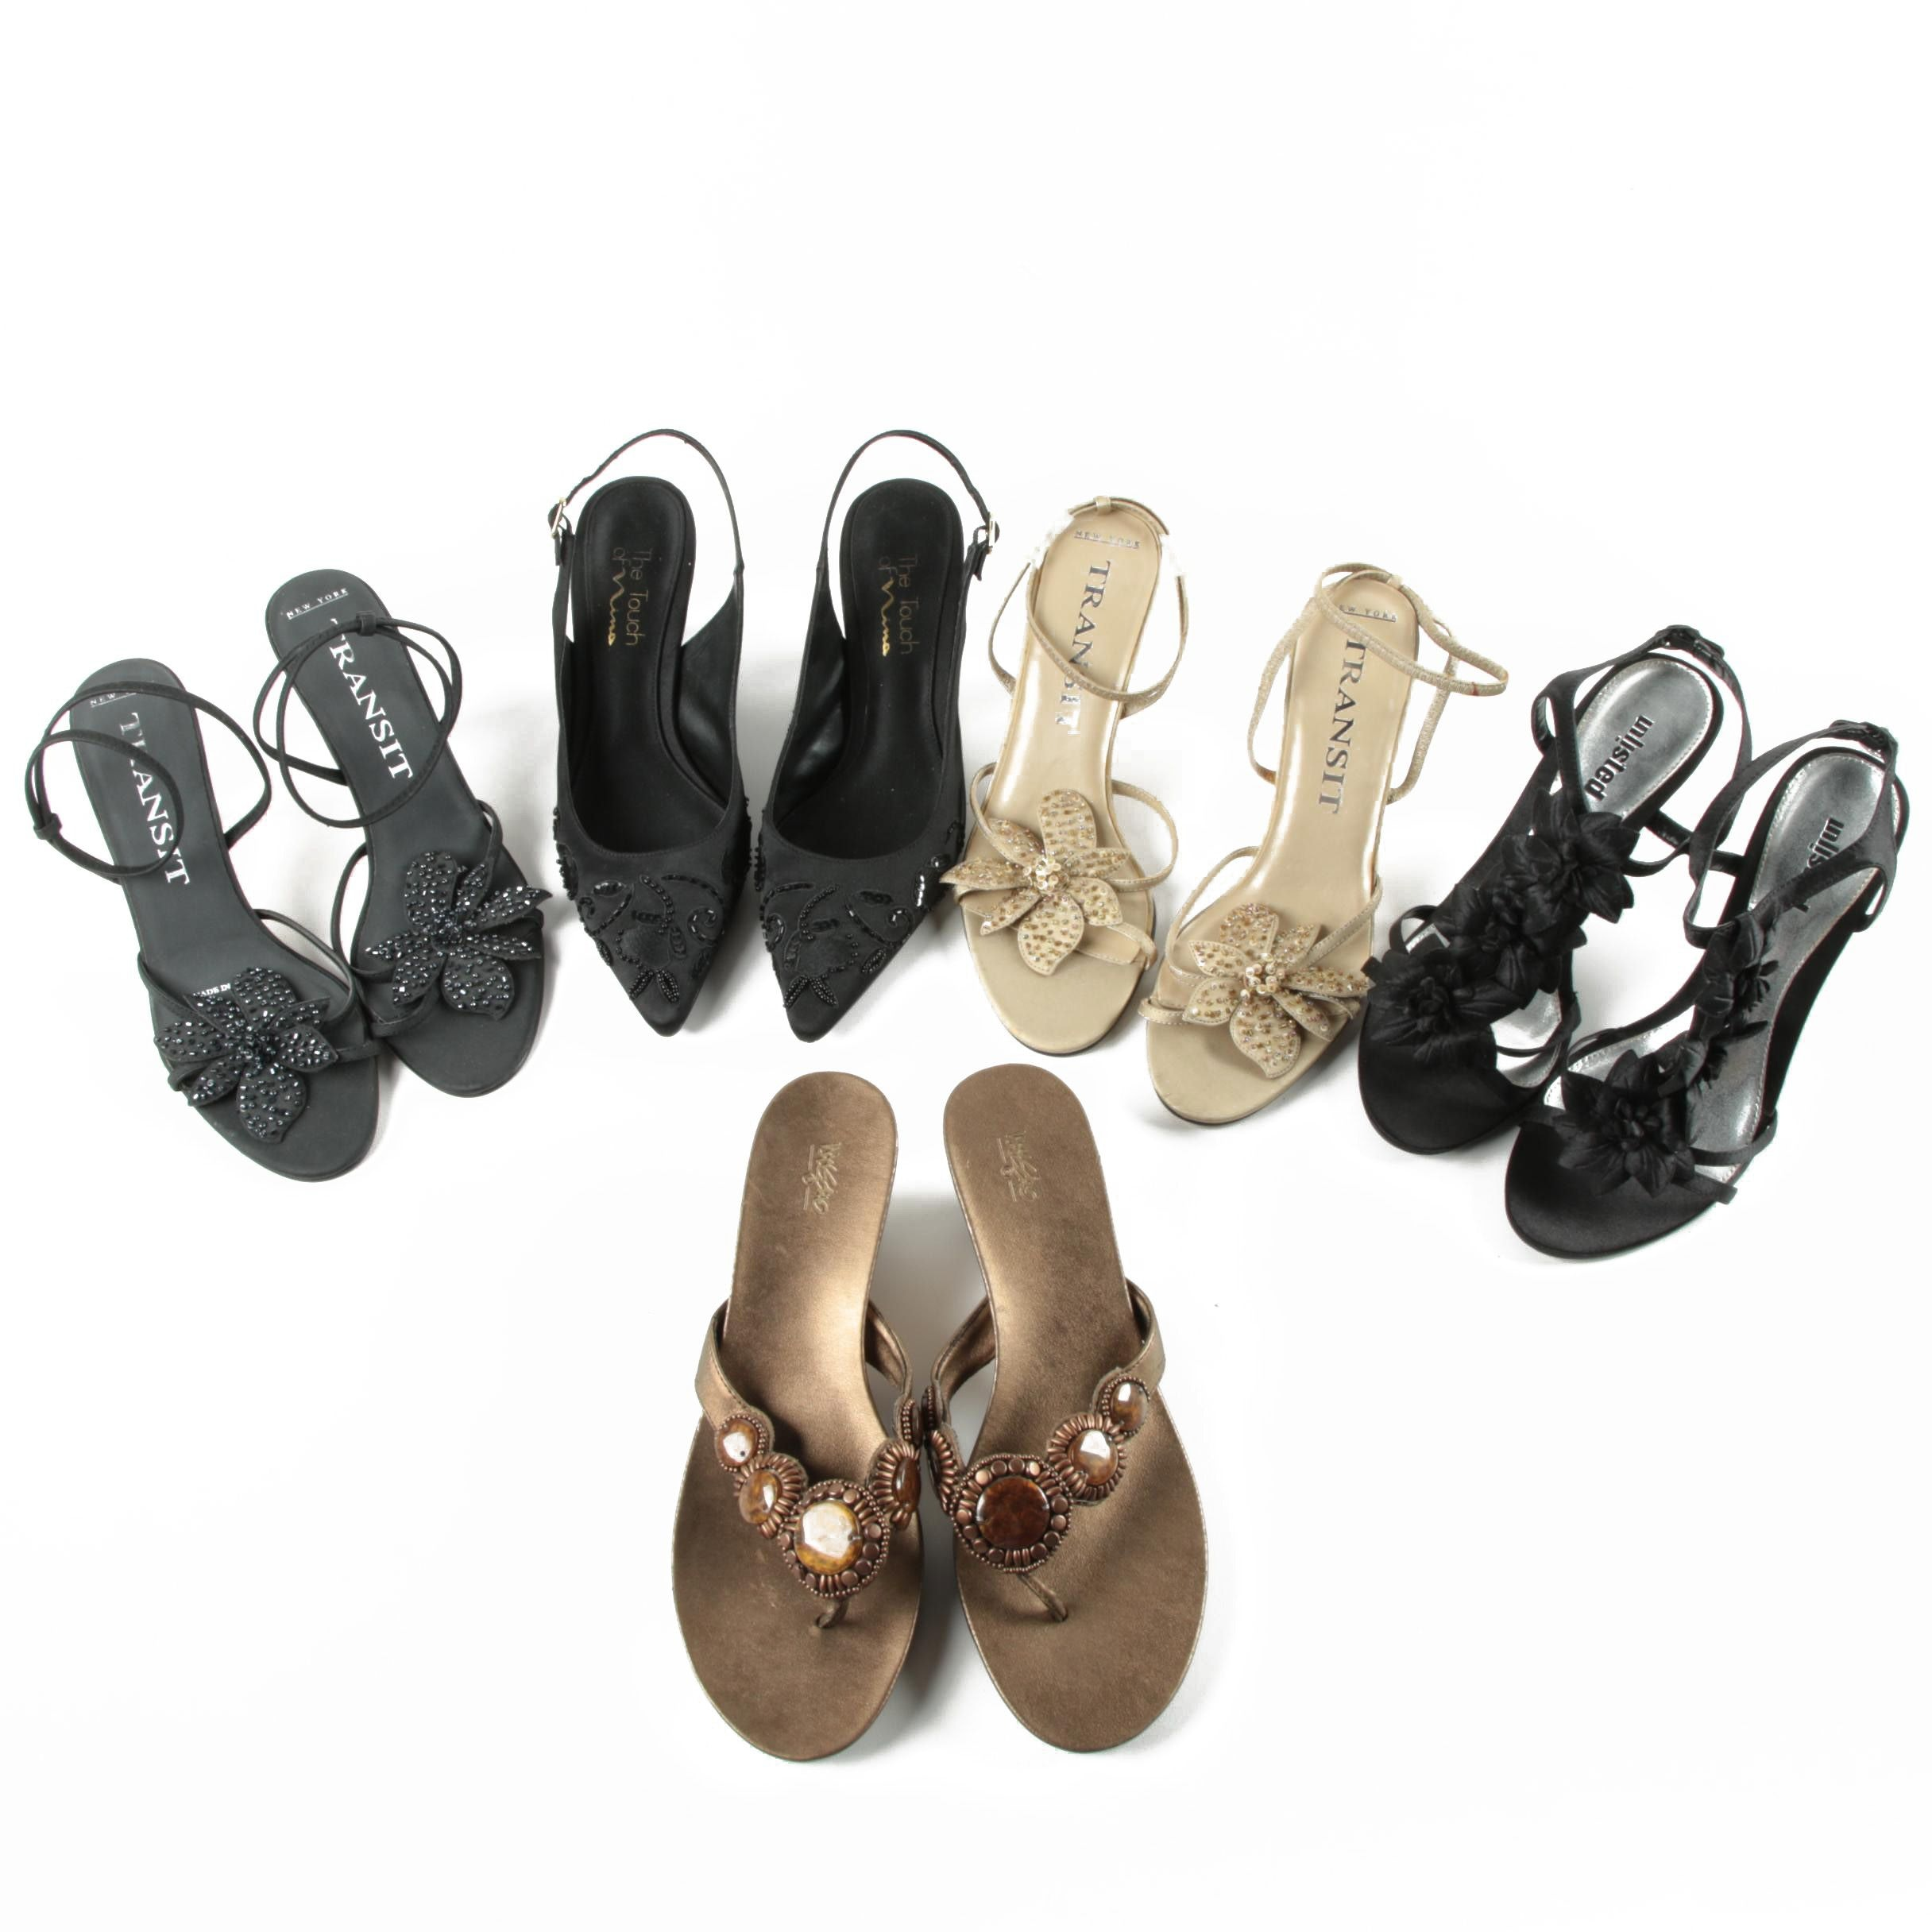 Women's Black Embellished Satin High Heels and Wedge Thong Sandals